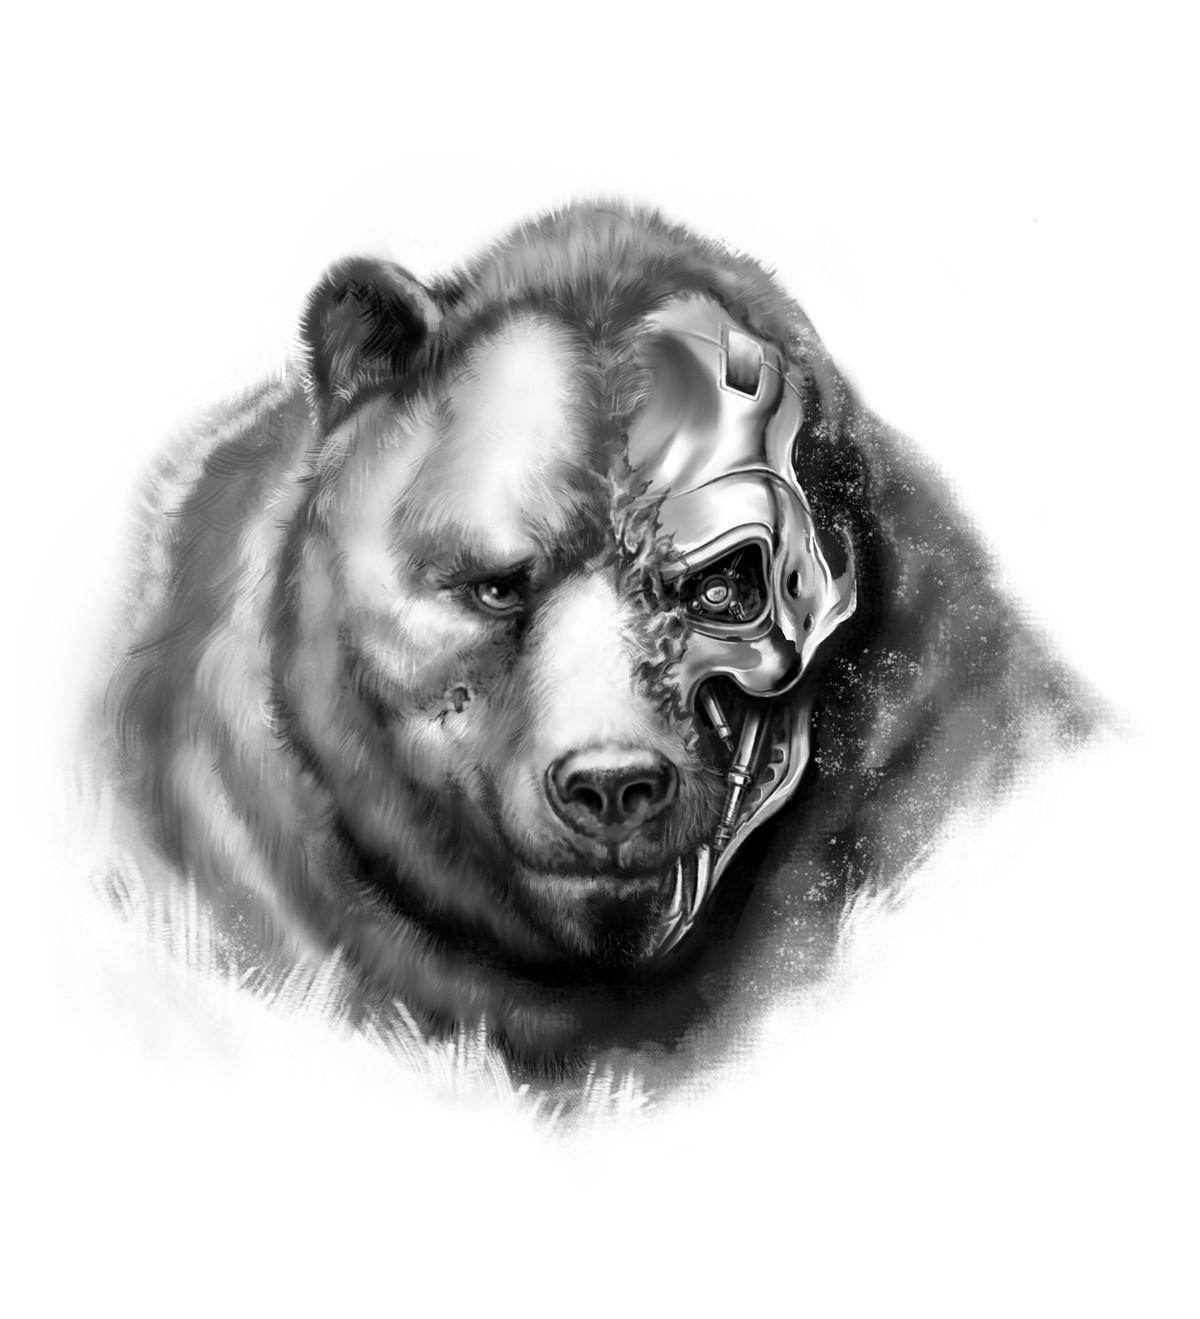 Tattoo design: draw a cybernetic bear!